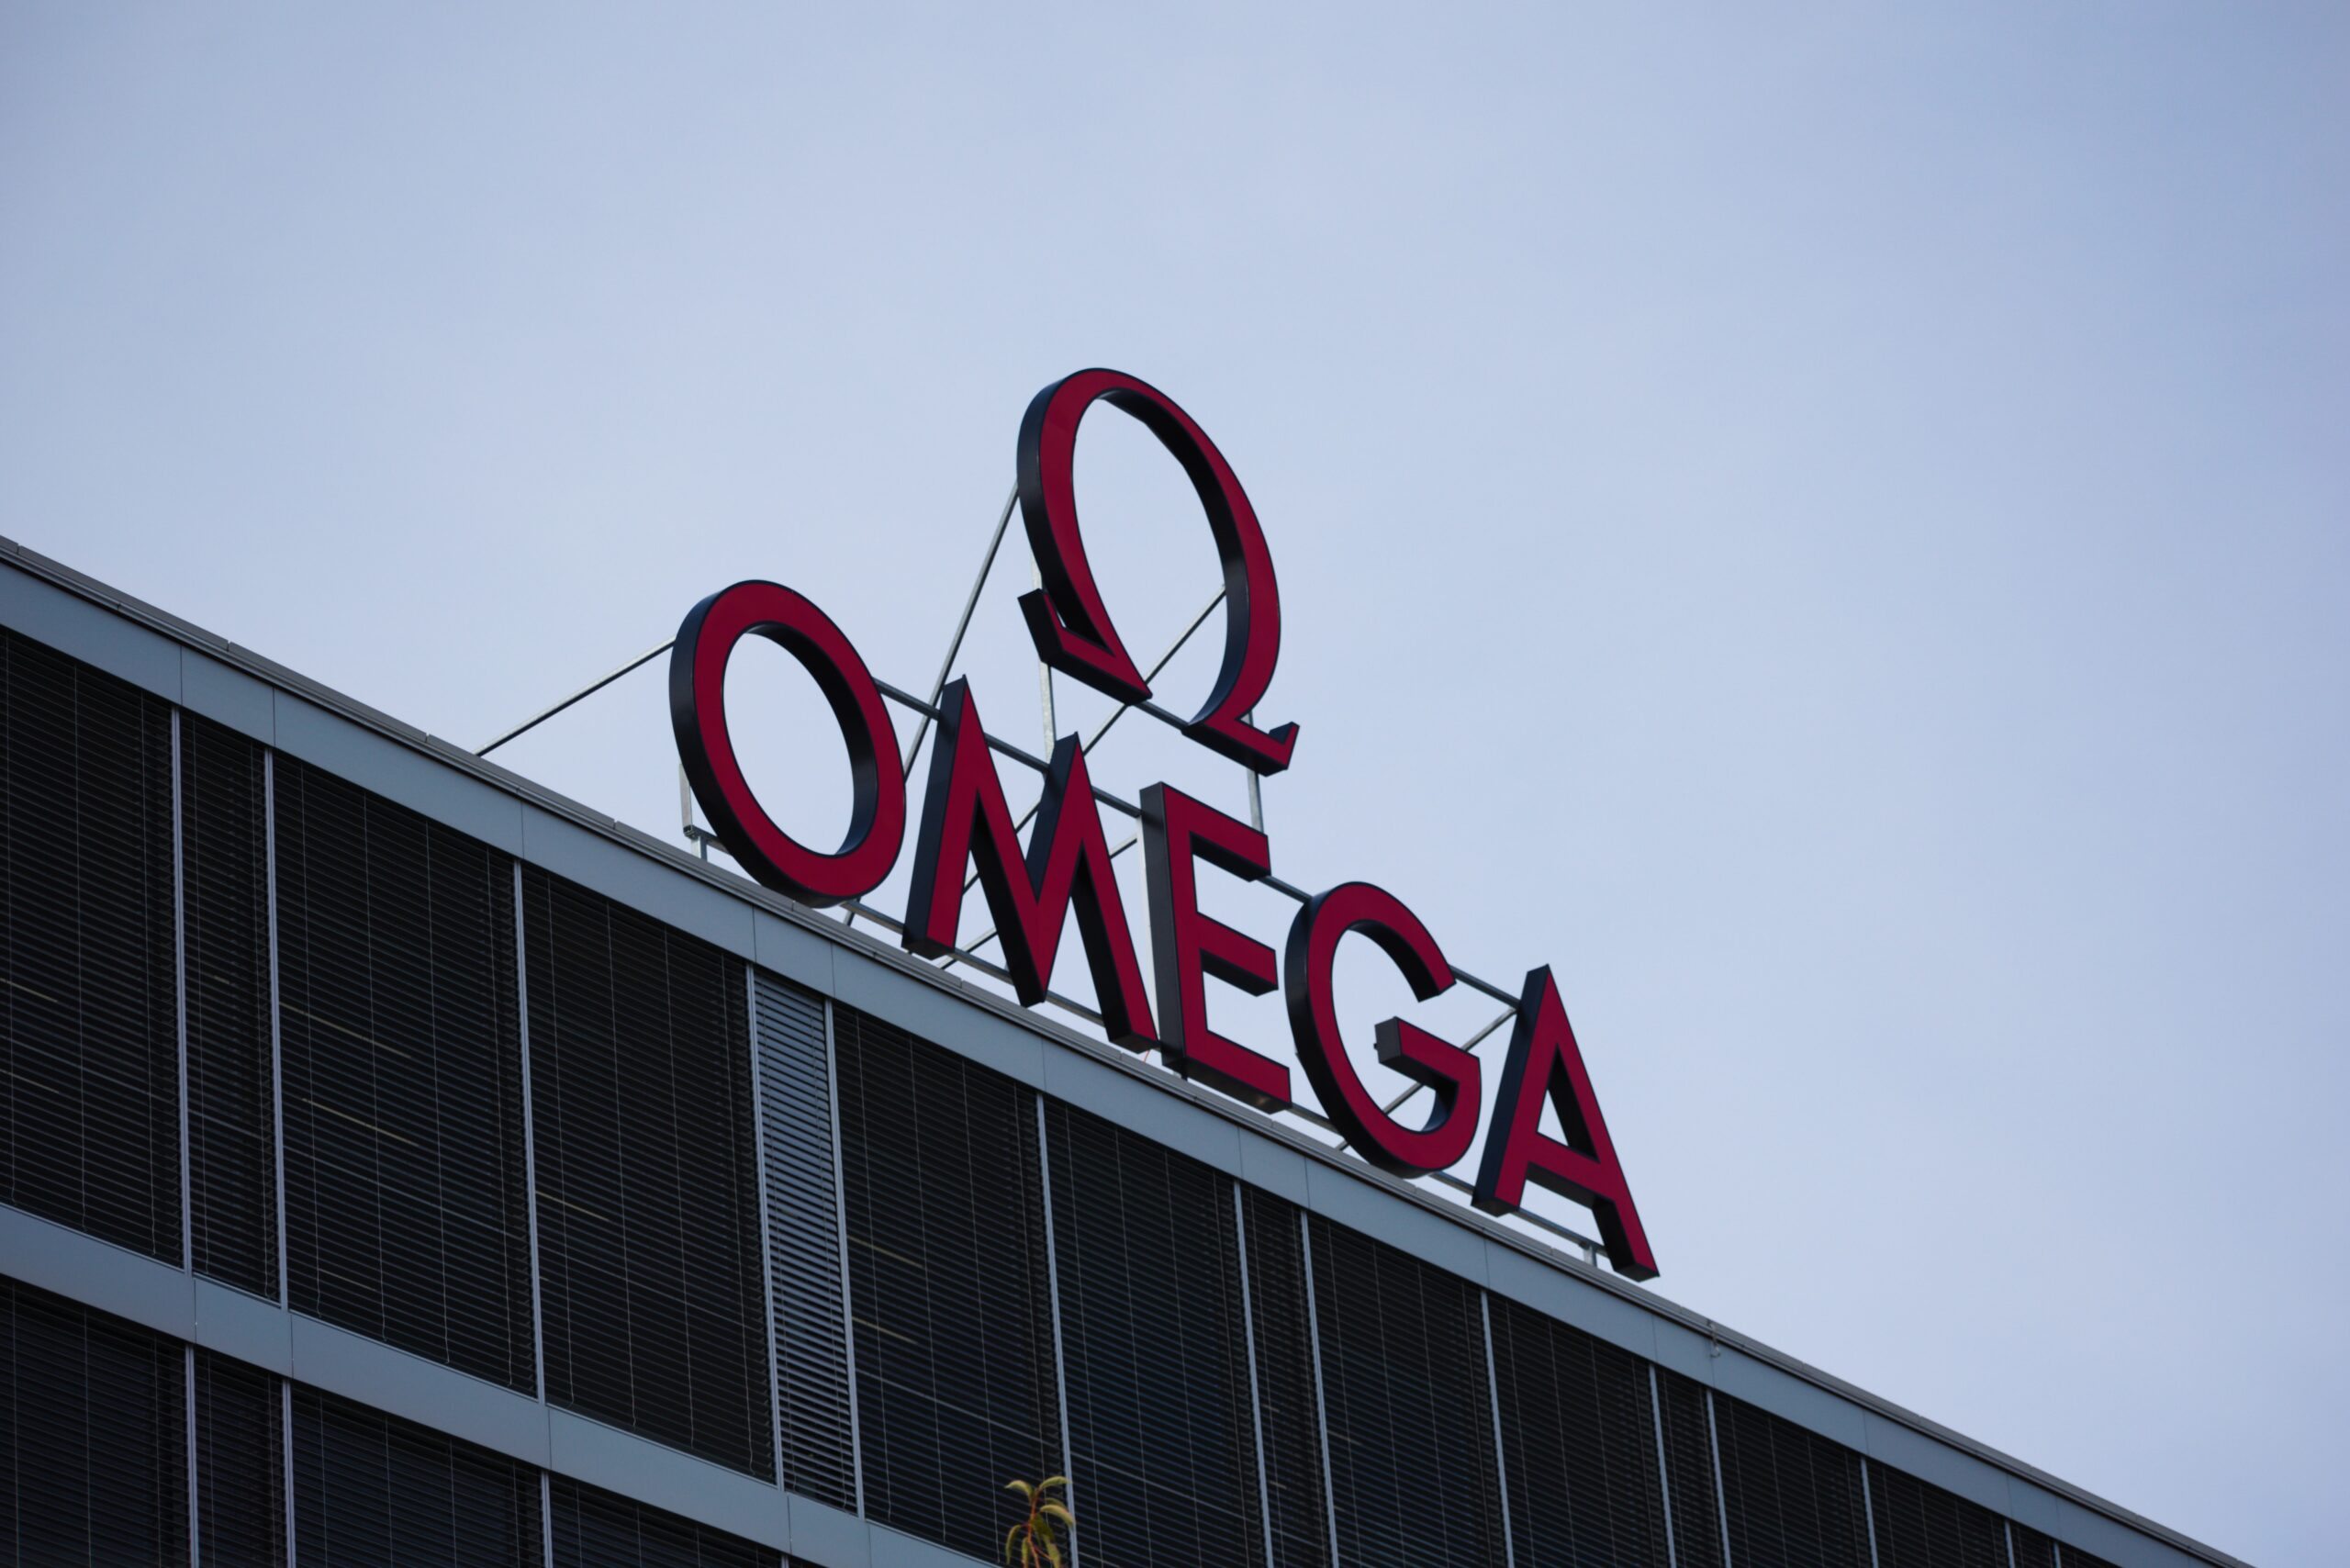 Omega sign logo